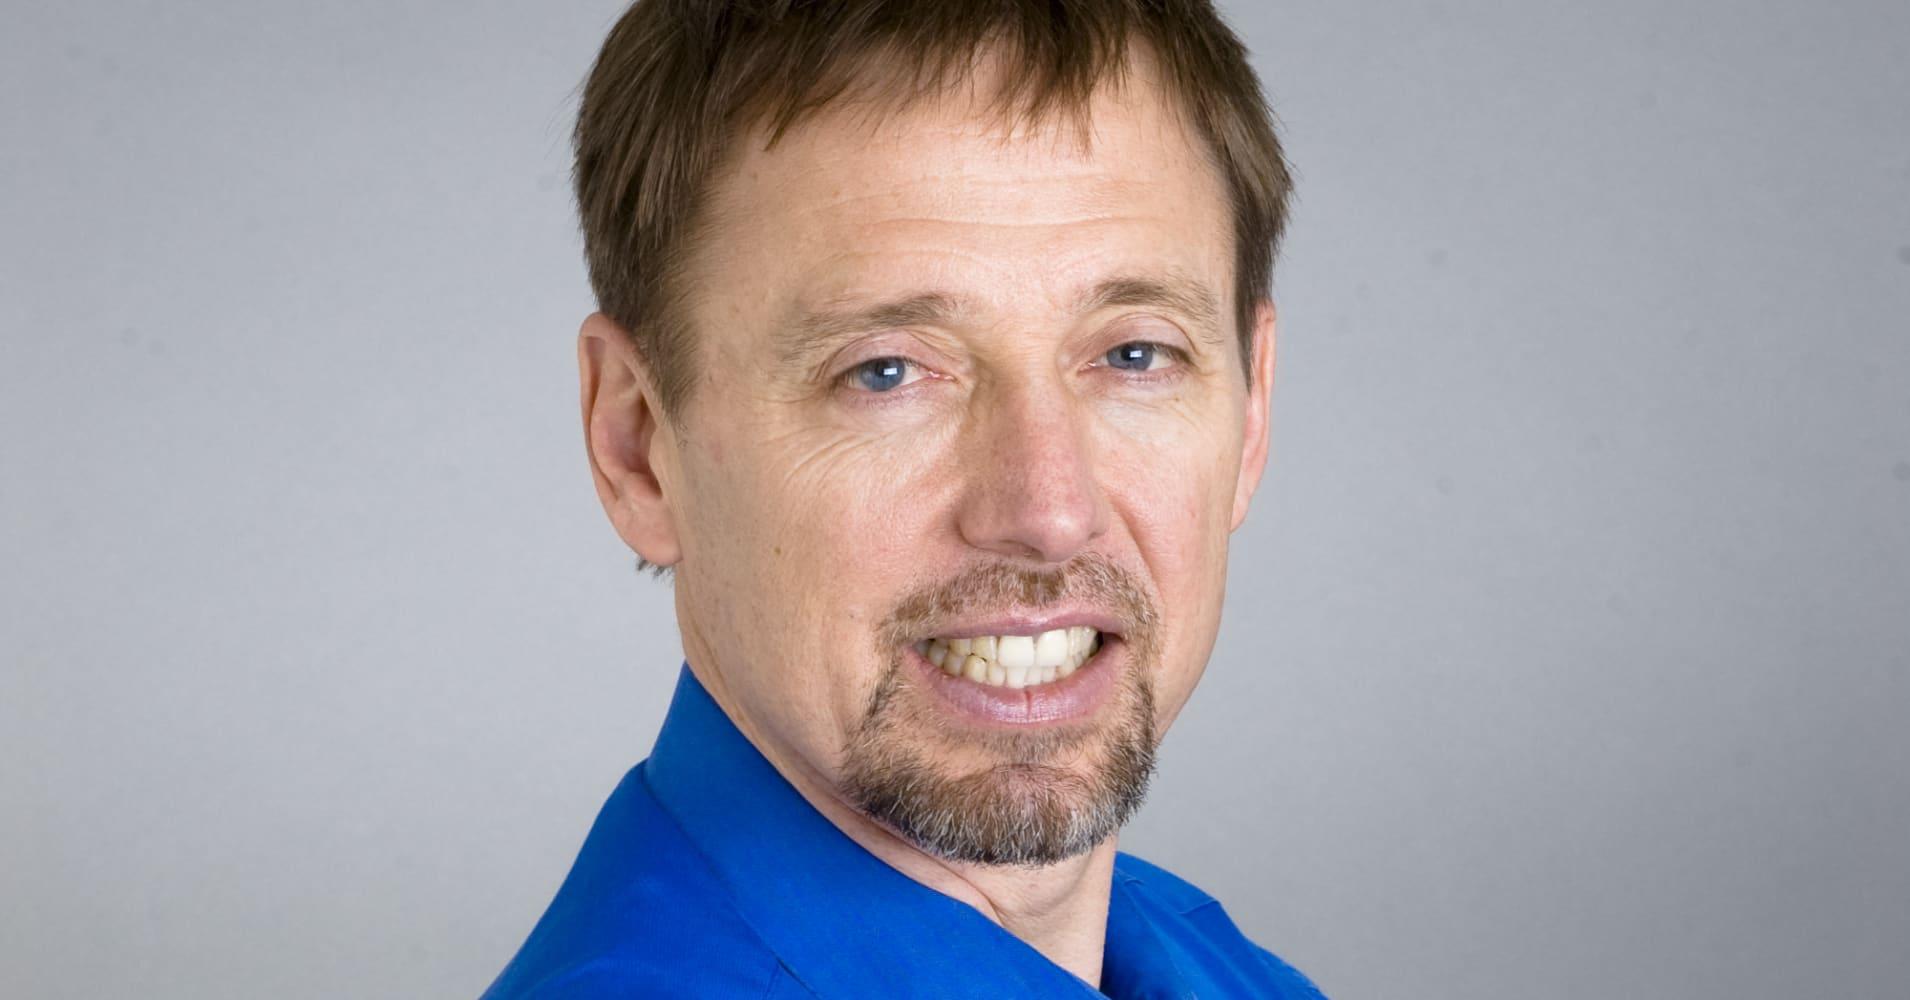 Chris Voss, former lead international kidnapping negotiator for the FBI